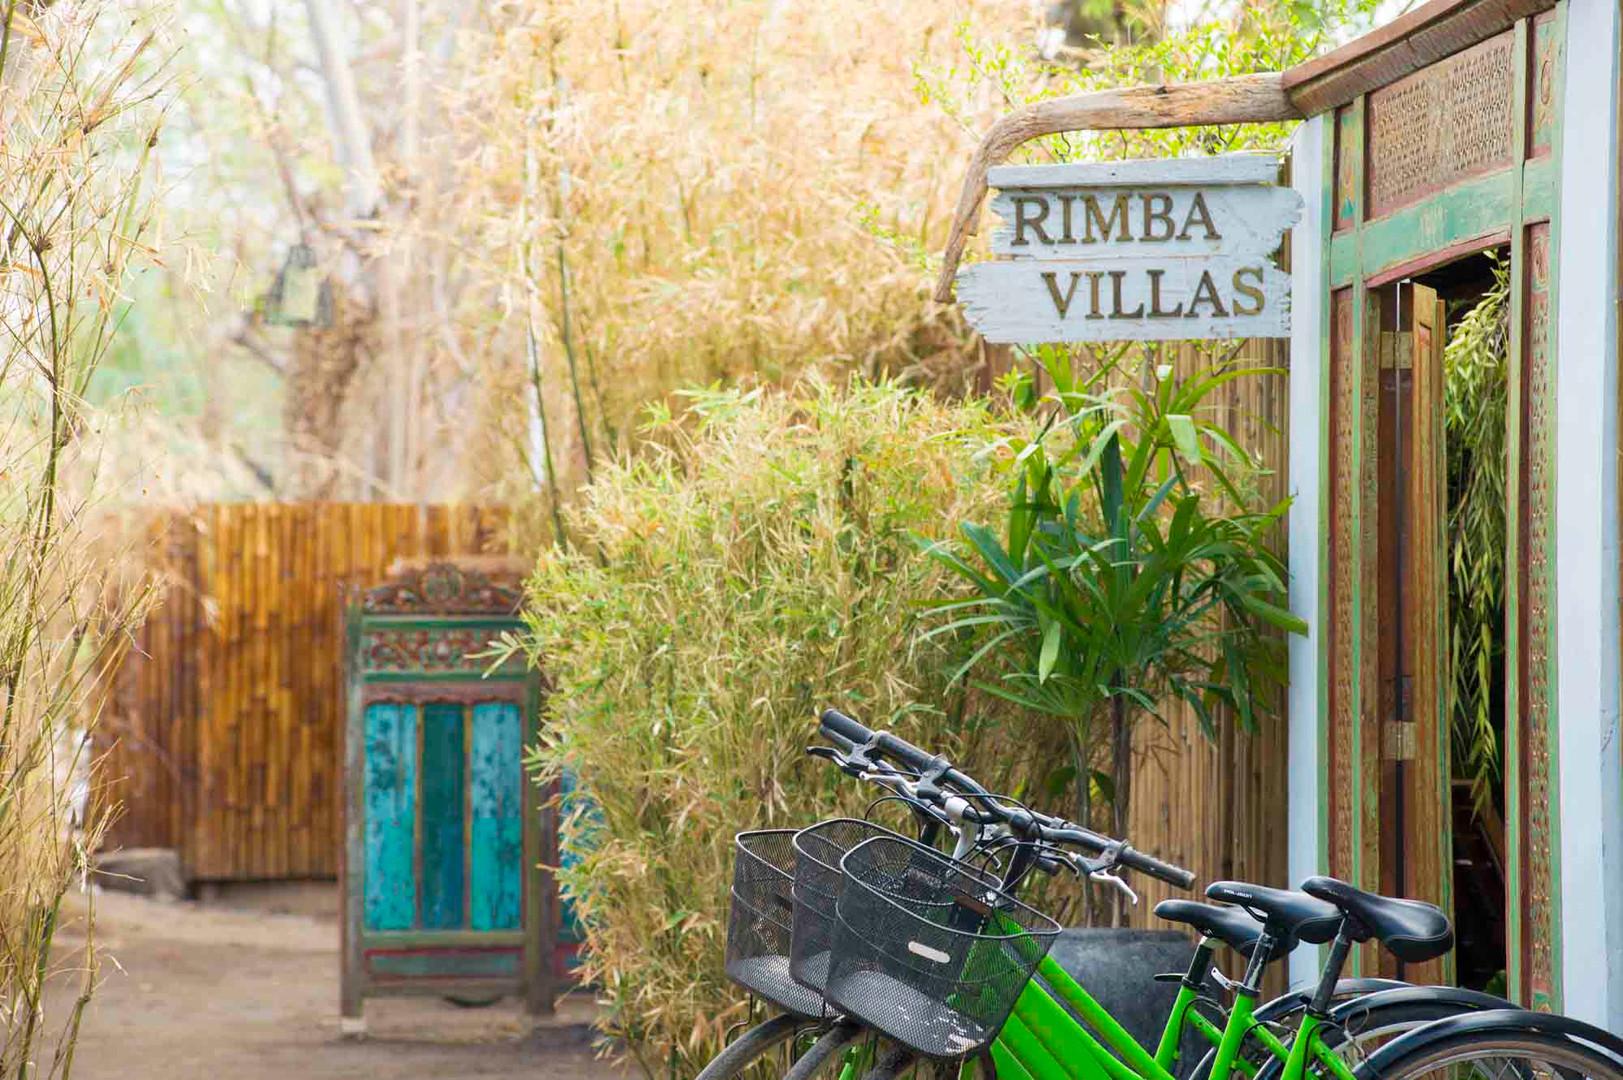 Villa Surya Rimba Villas Gili Air 28.jpg